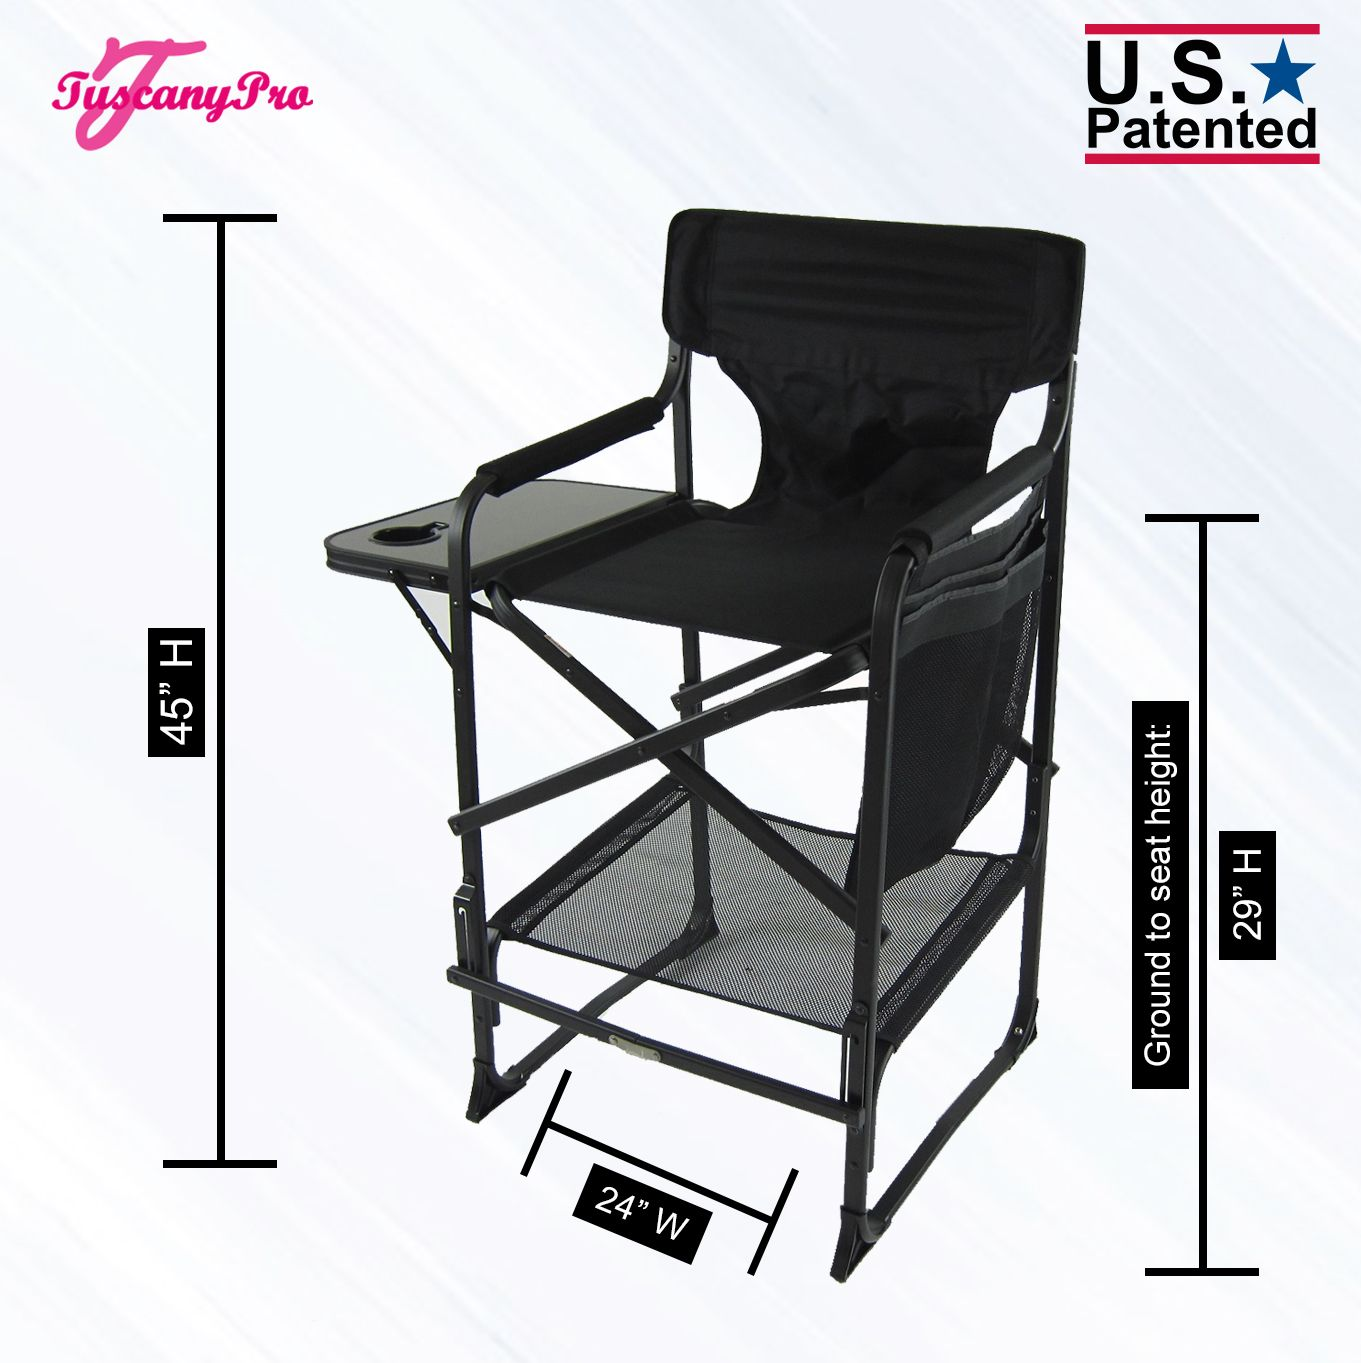 Portable Salon Chairs